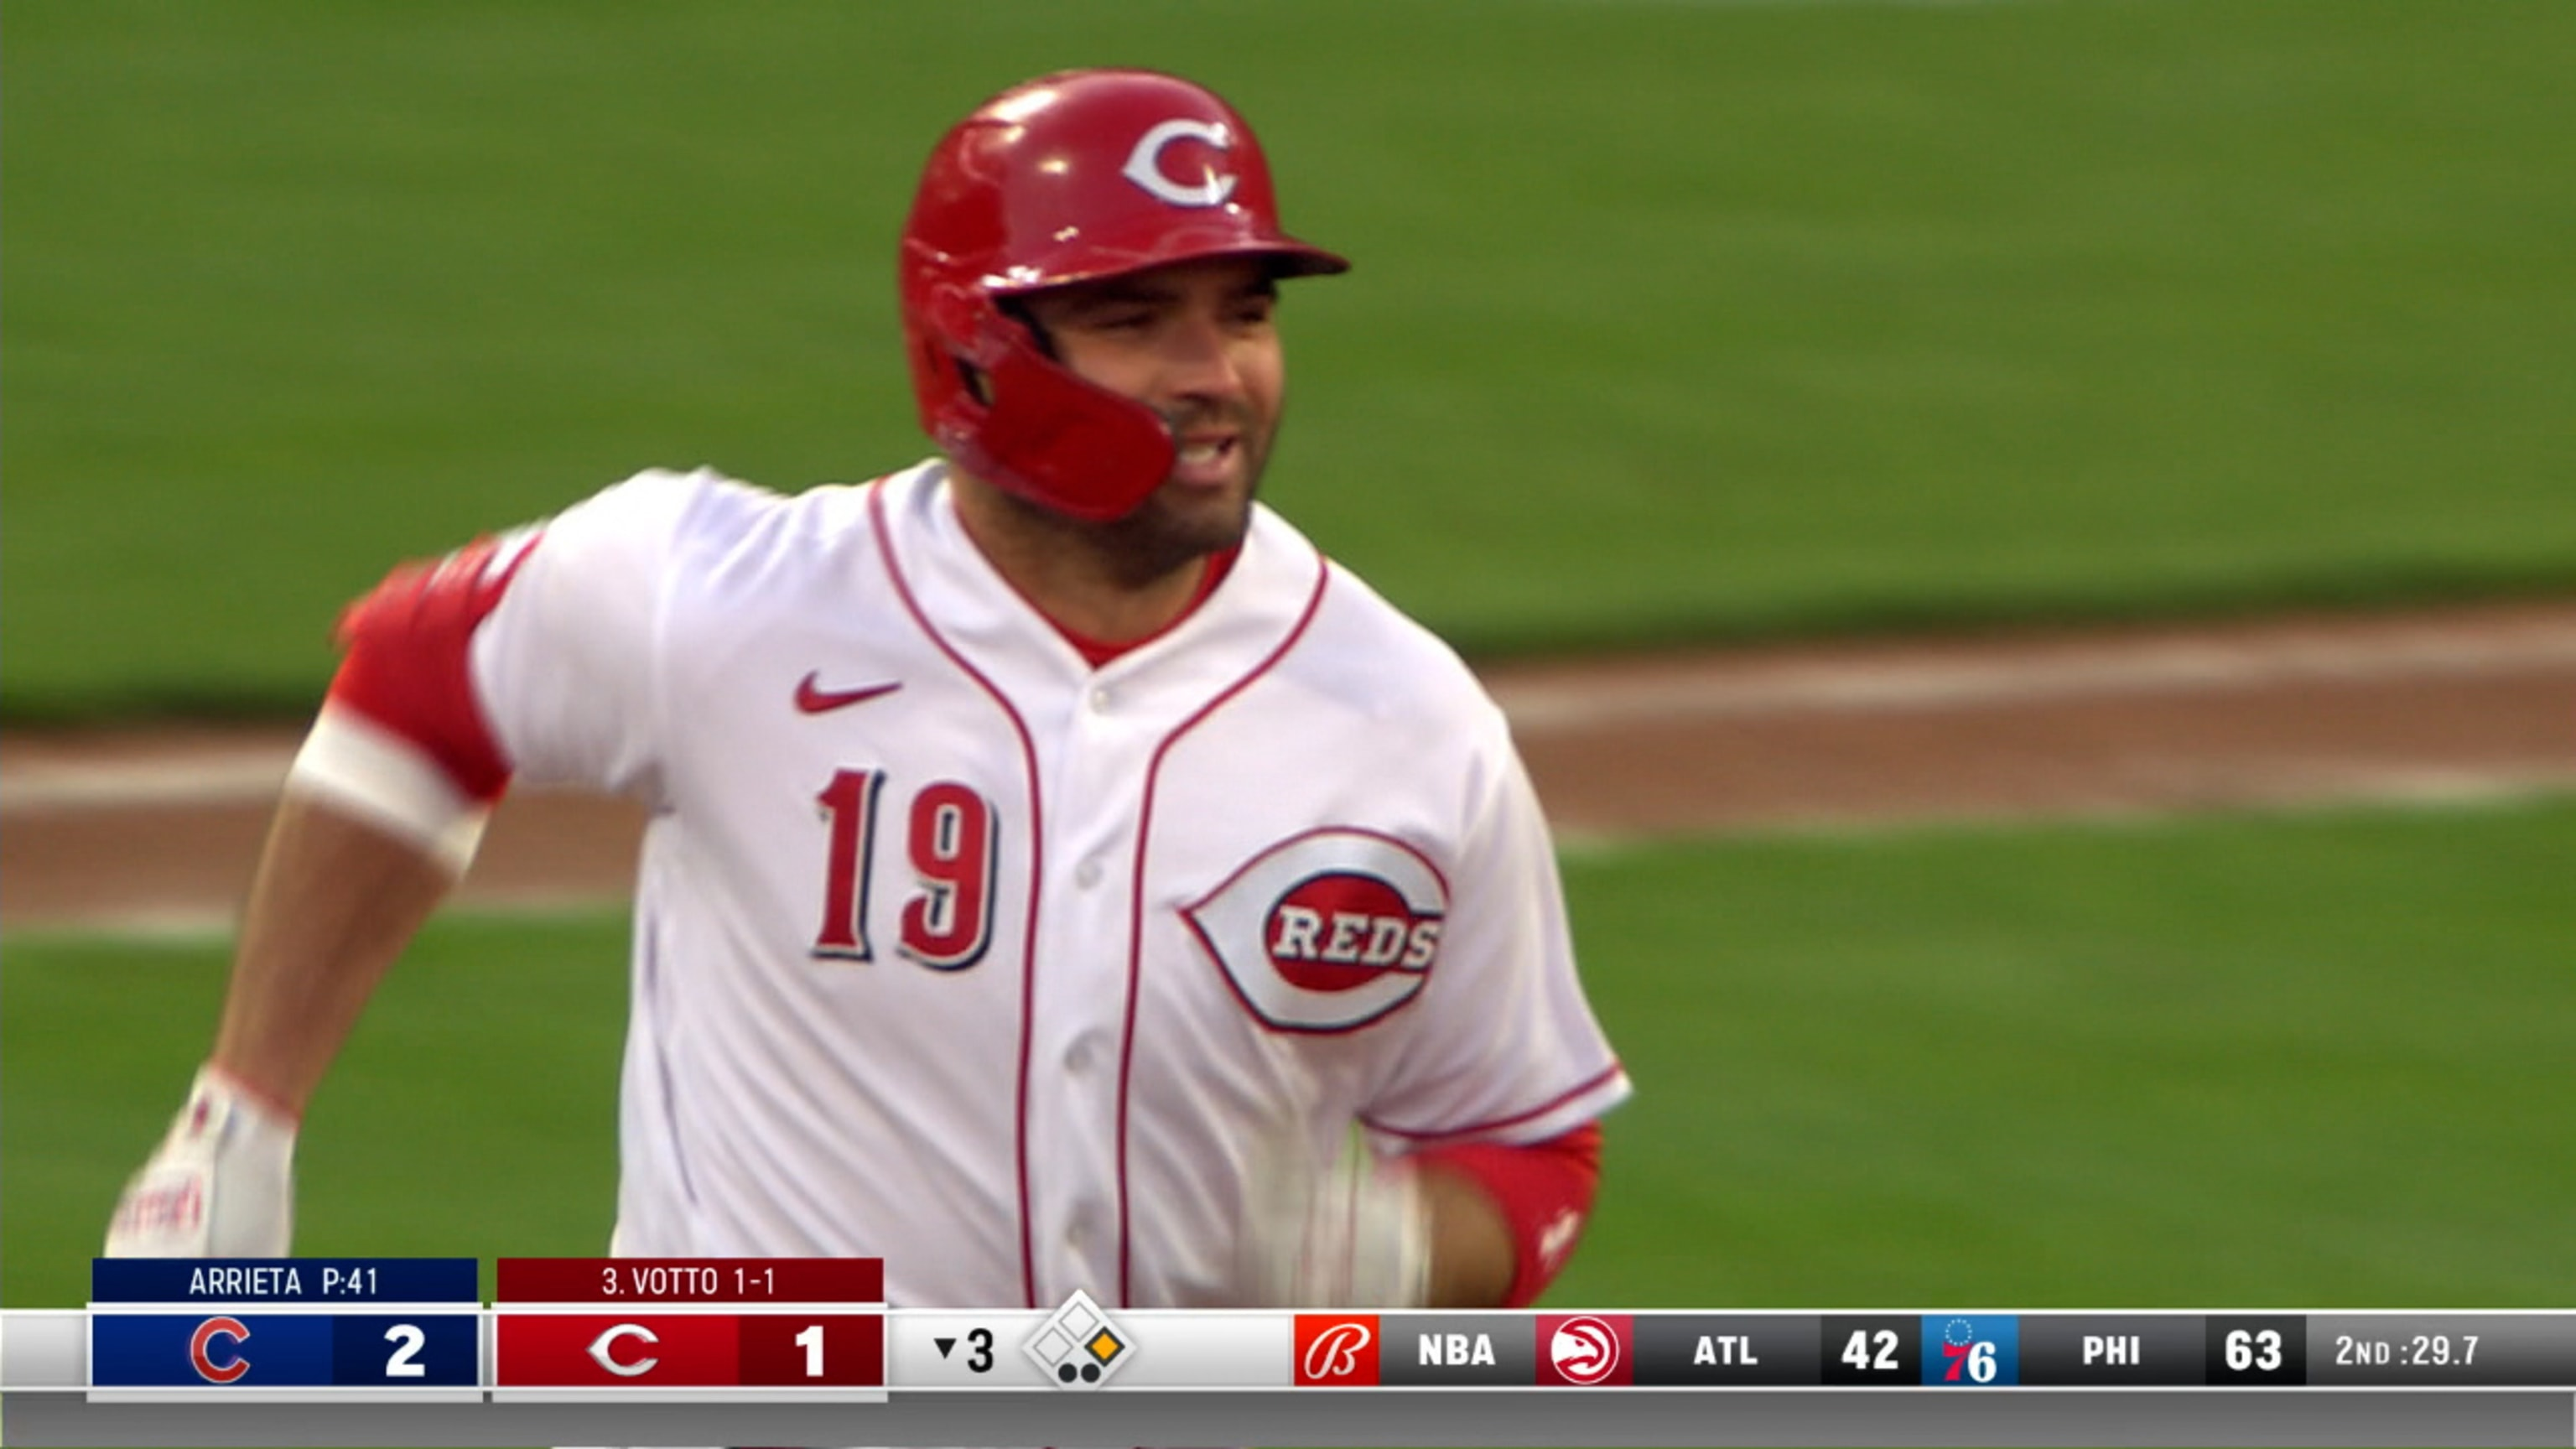 Joey Votto hits 300th career home run